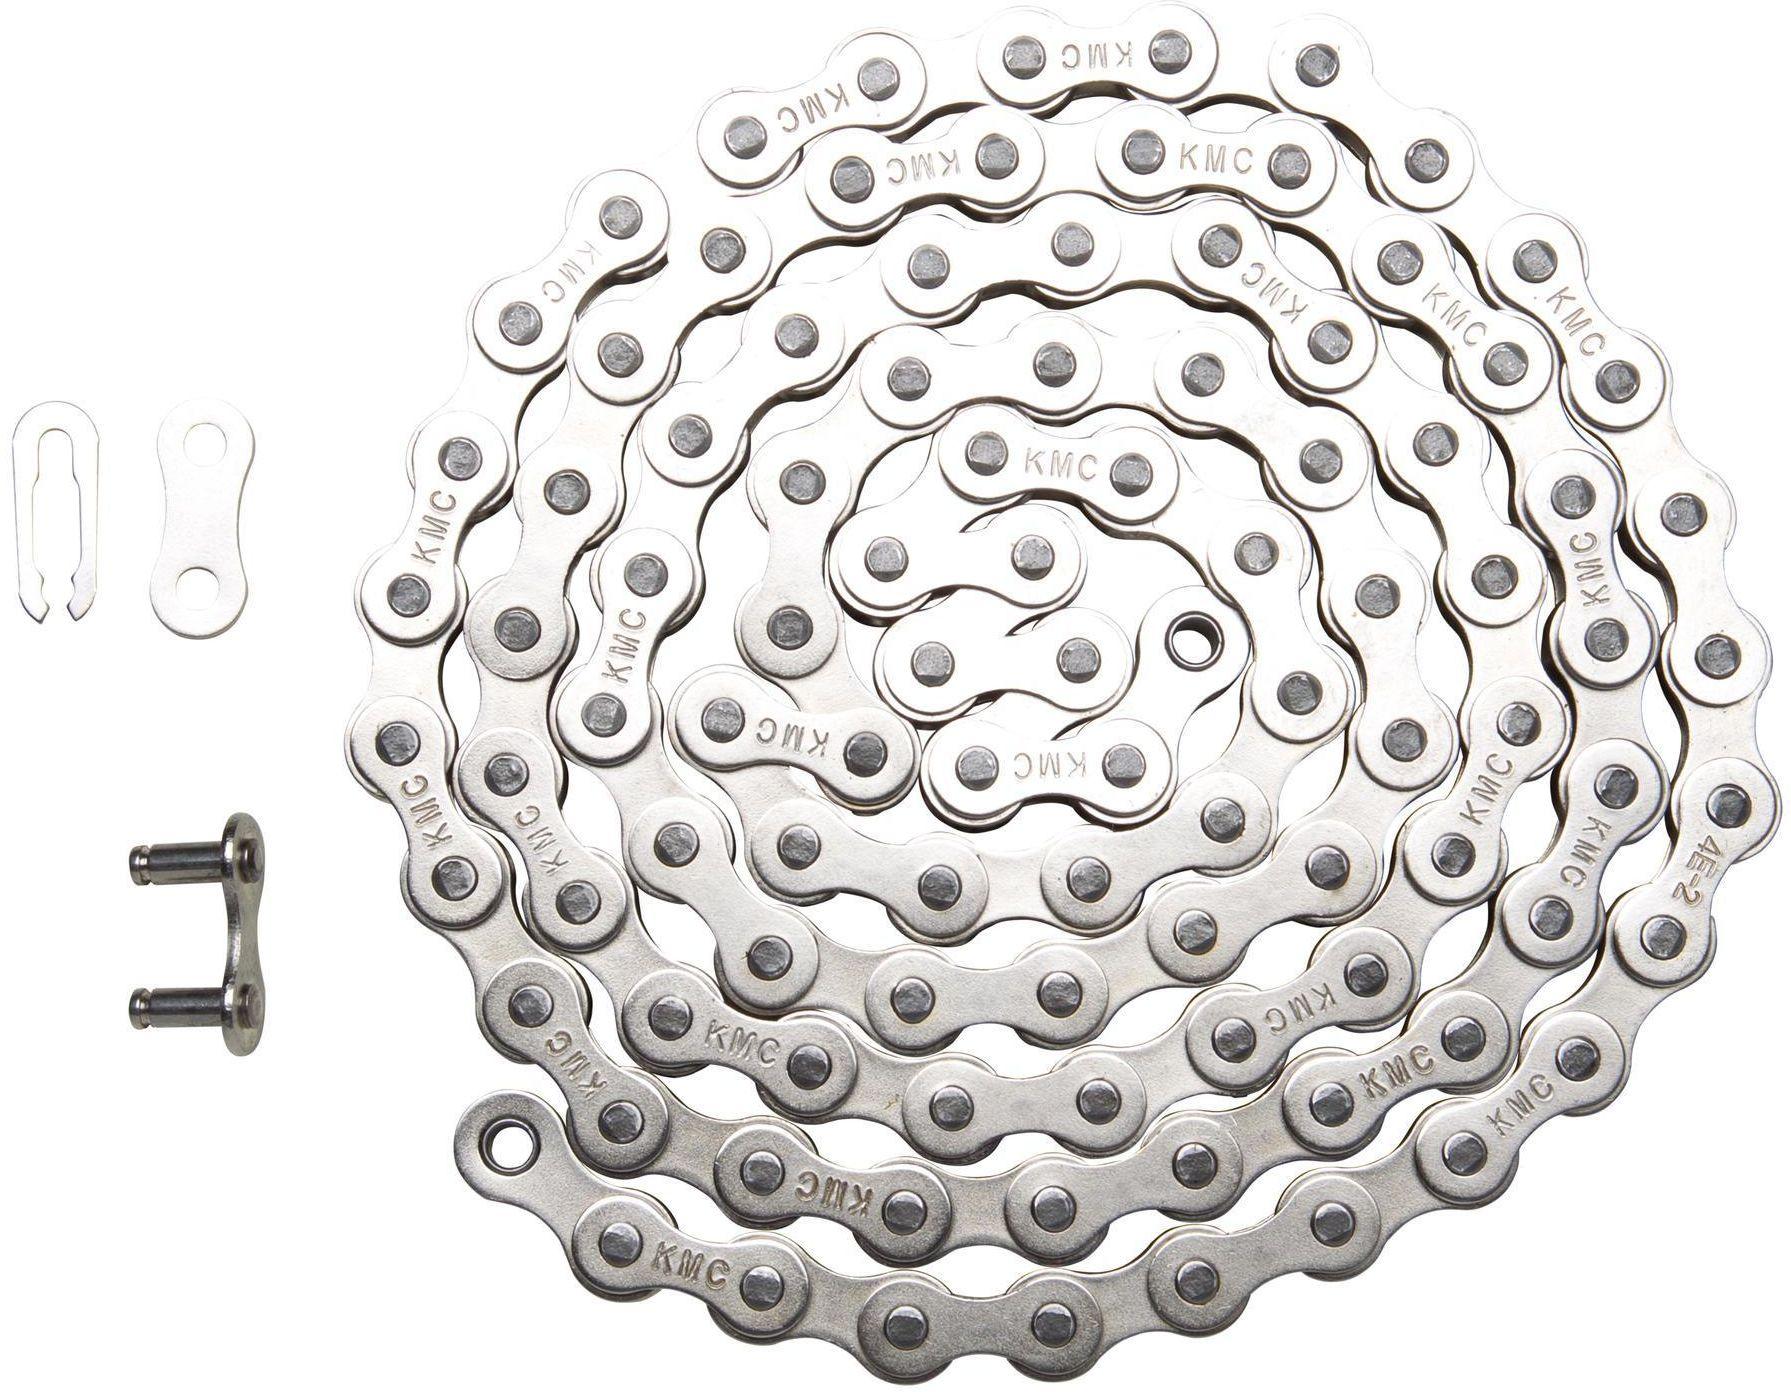 Łańcuch rowerowy do BMX